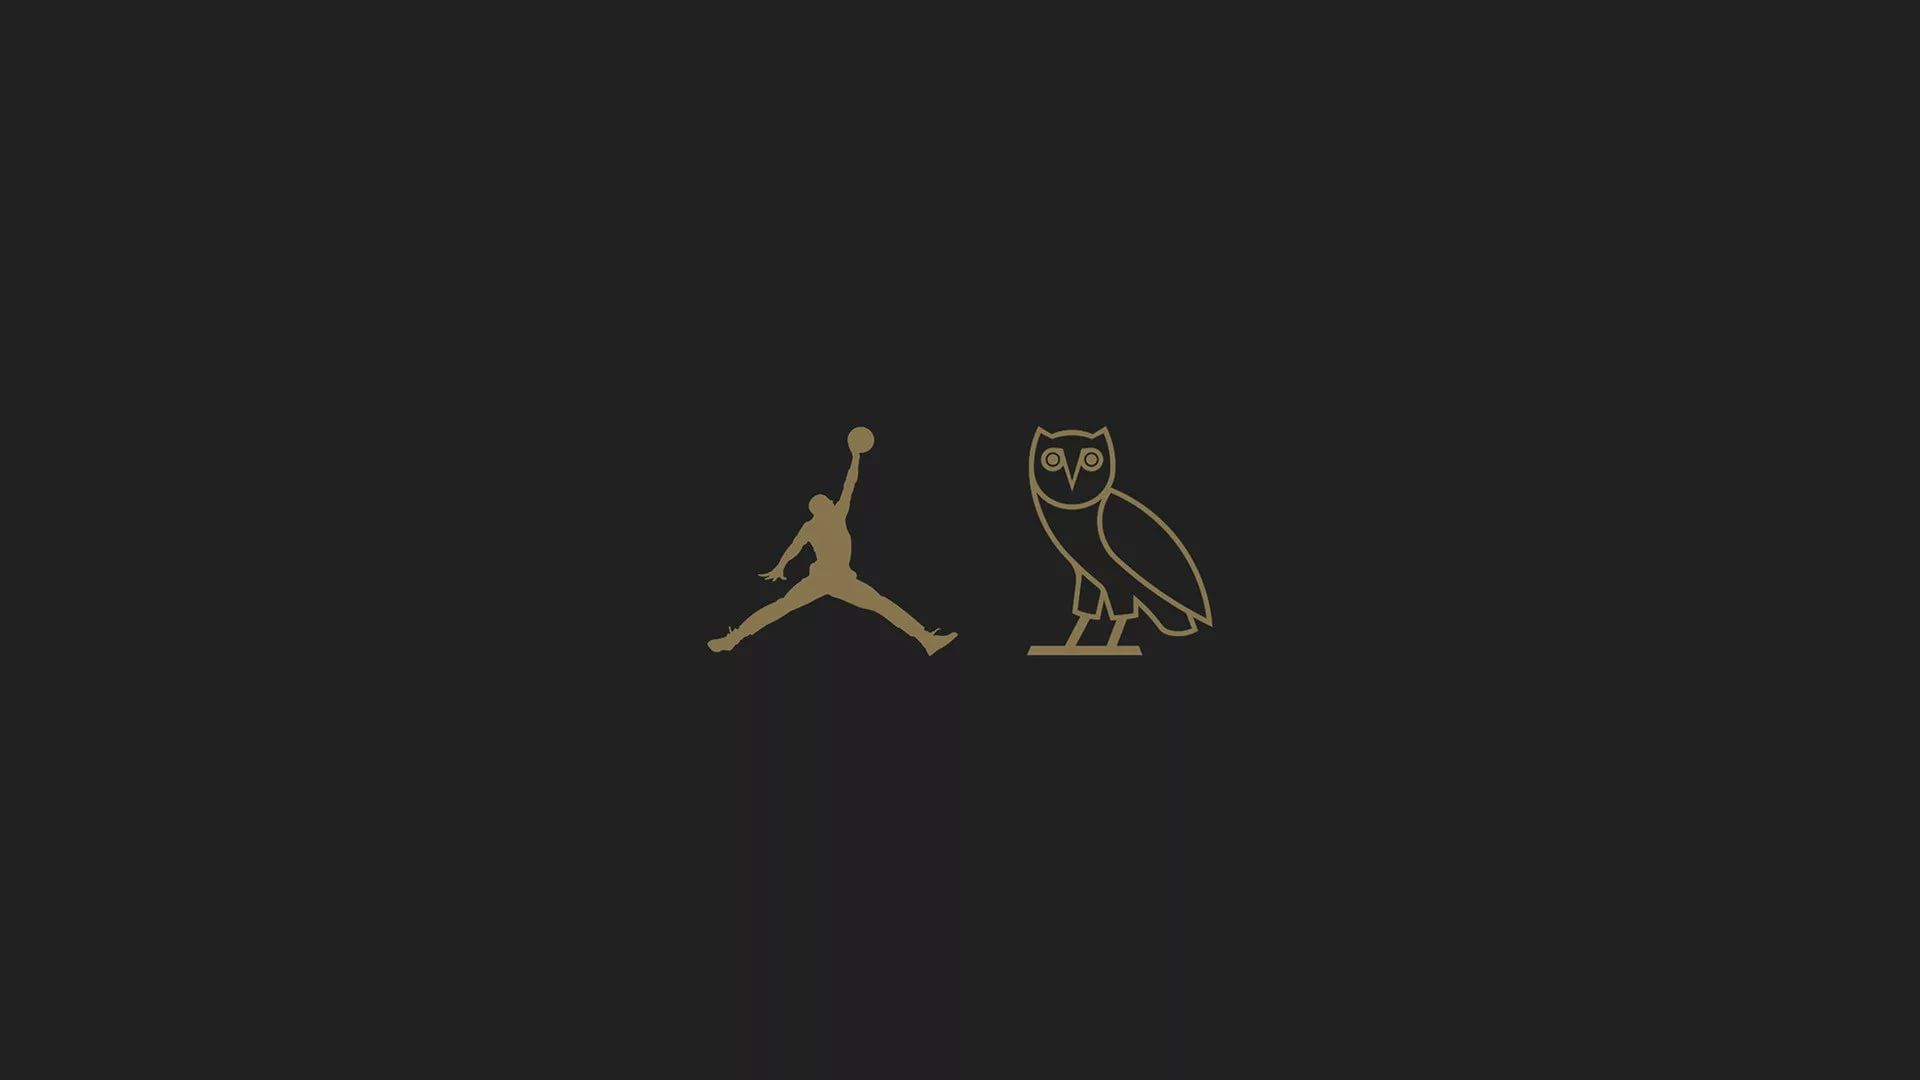 Drake Ovo hd wallpaper